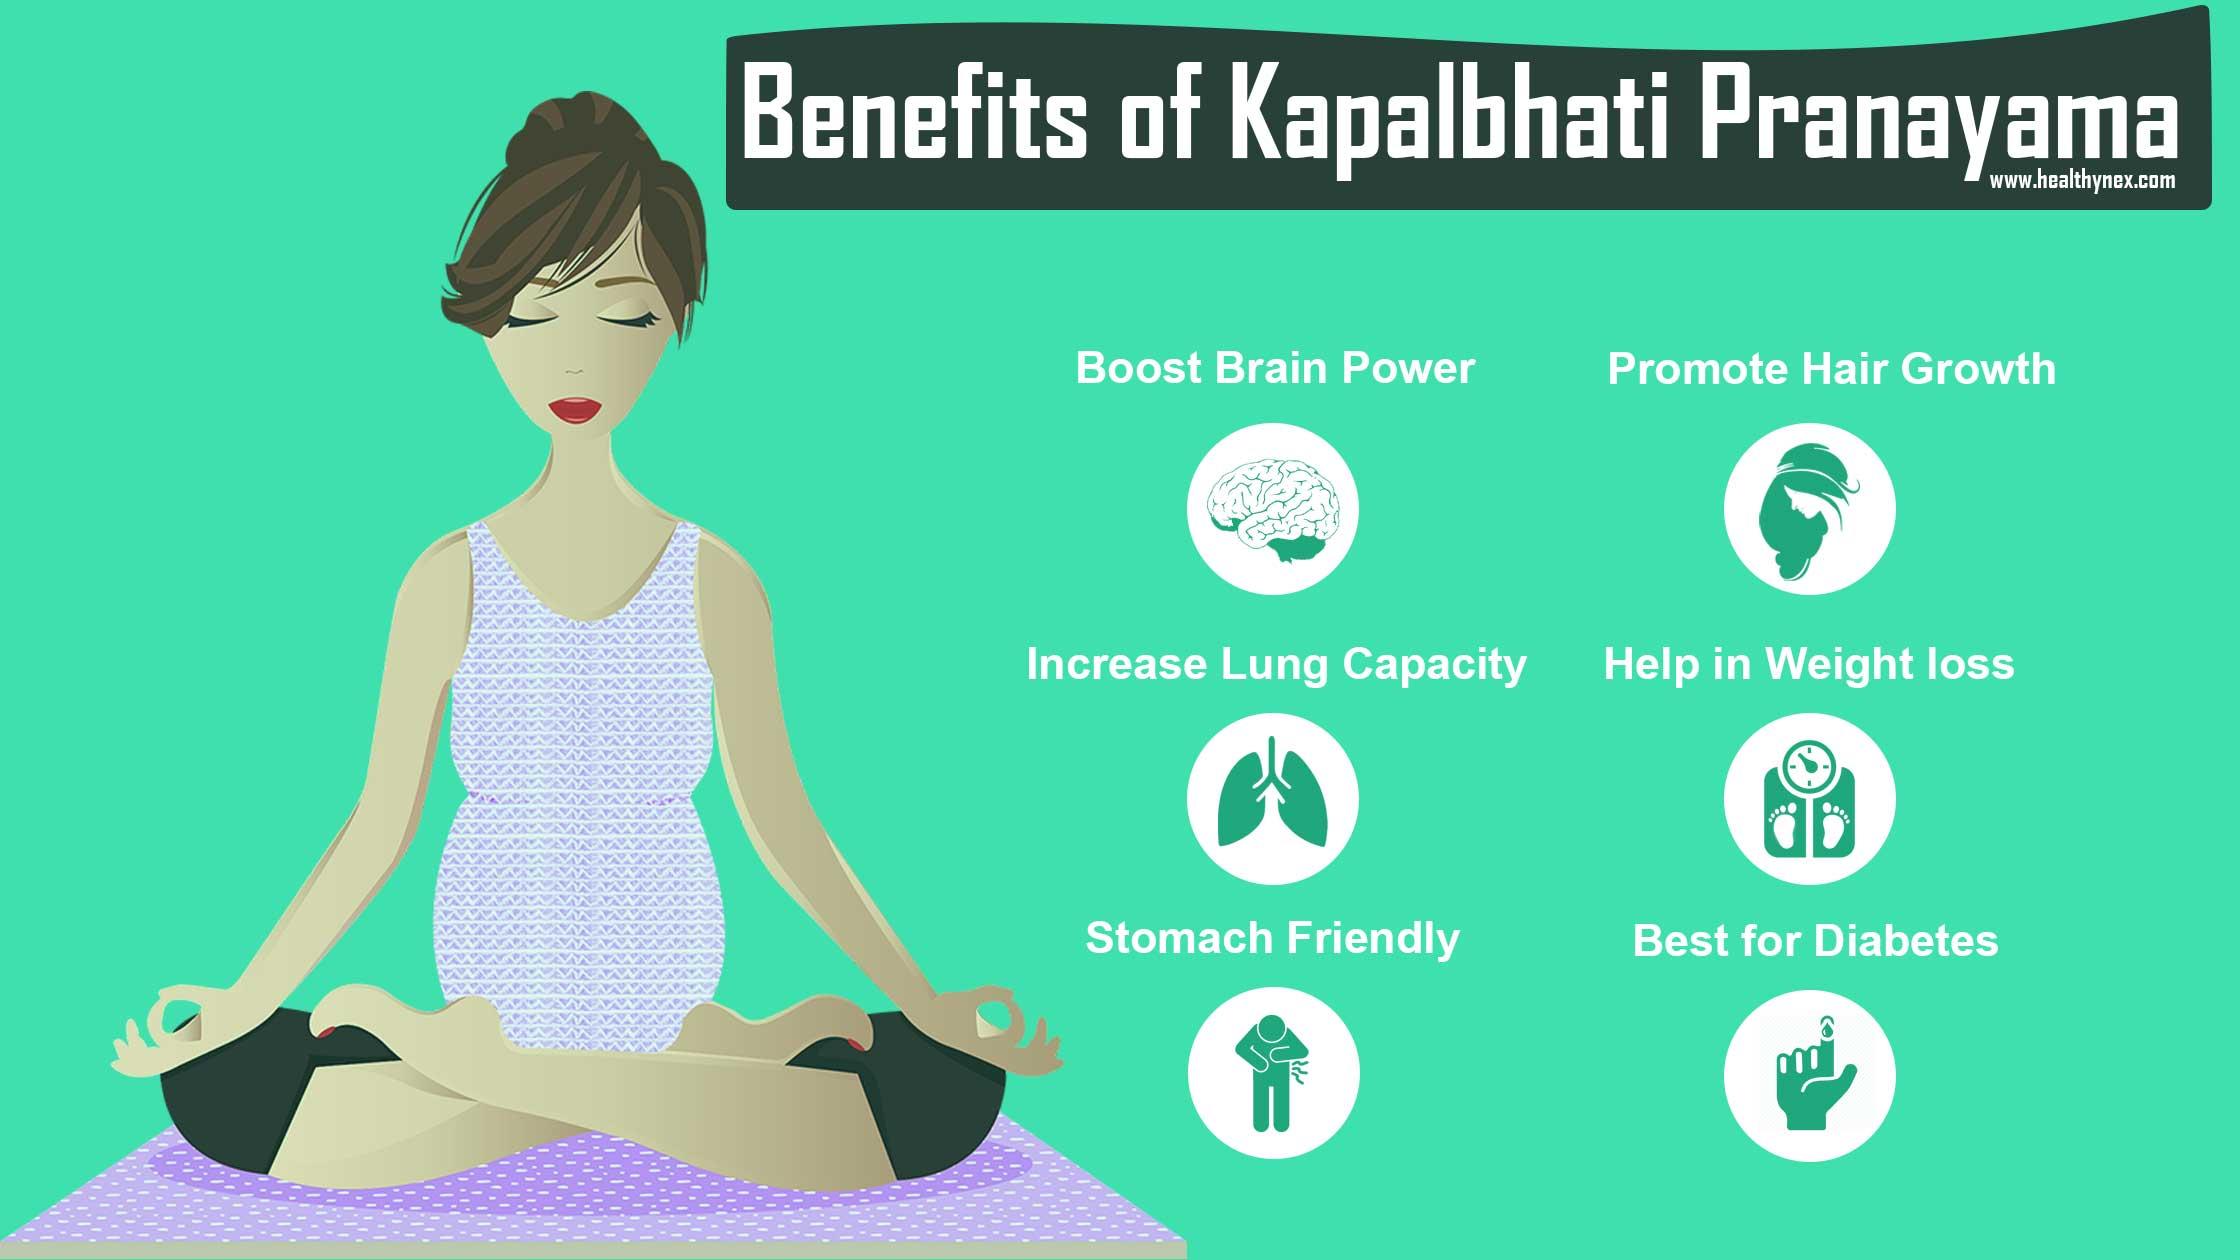 Benefits of Kapalbhati Pranayama